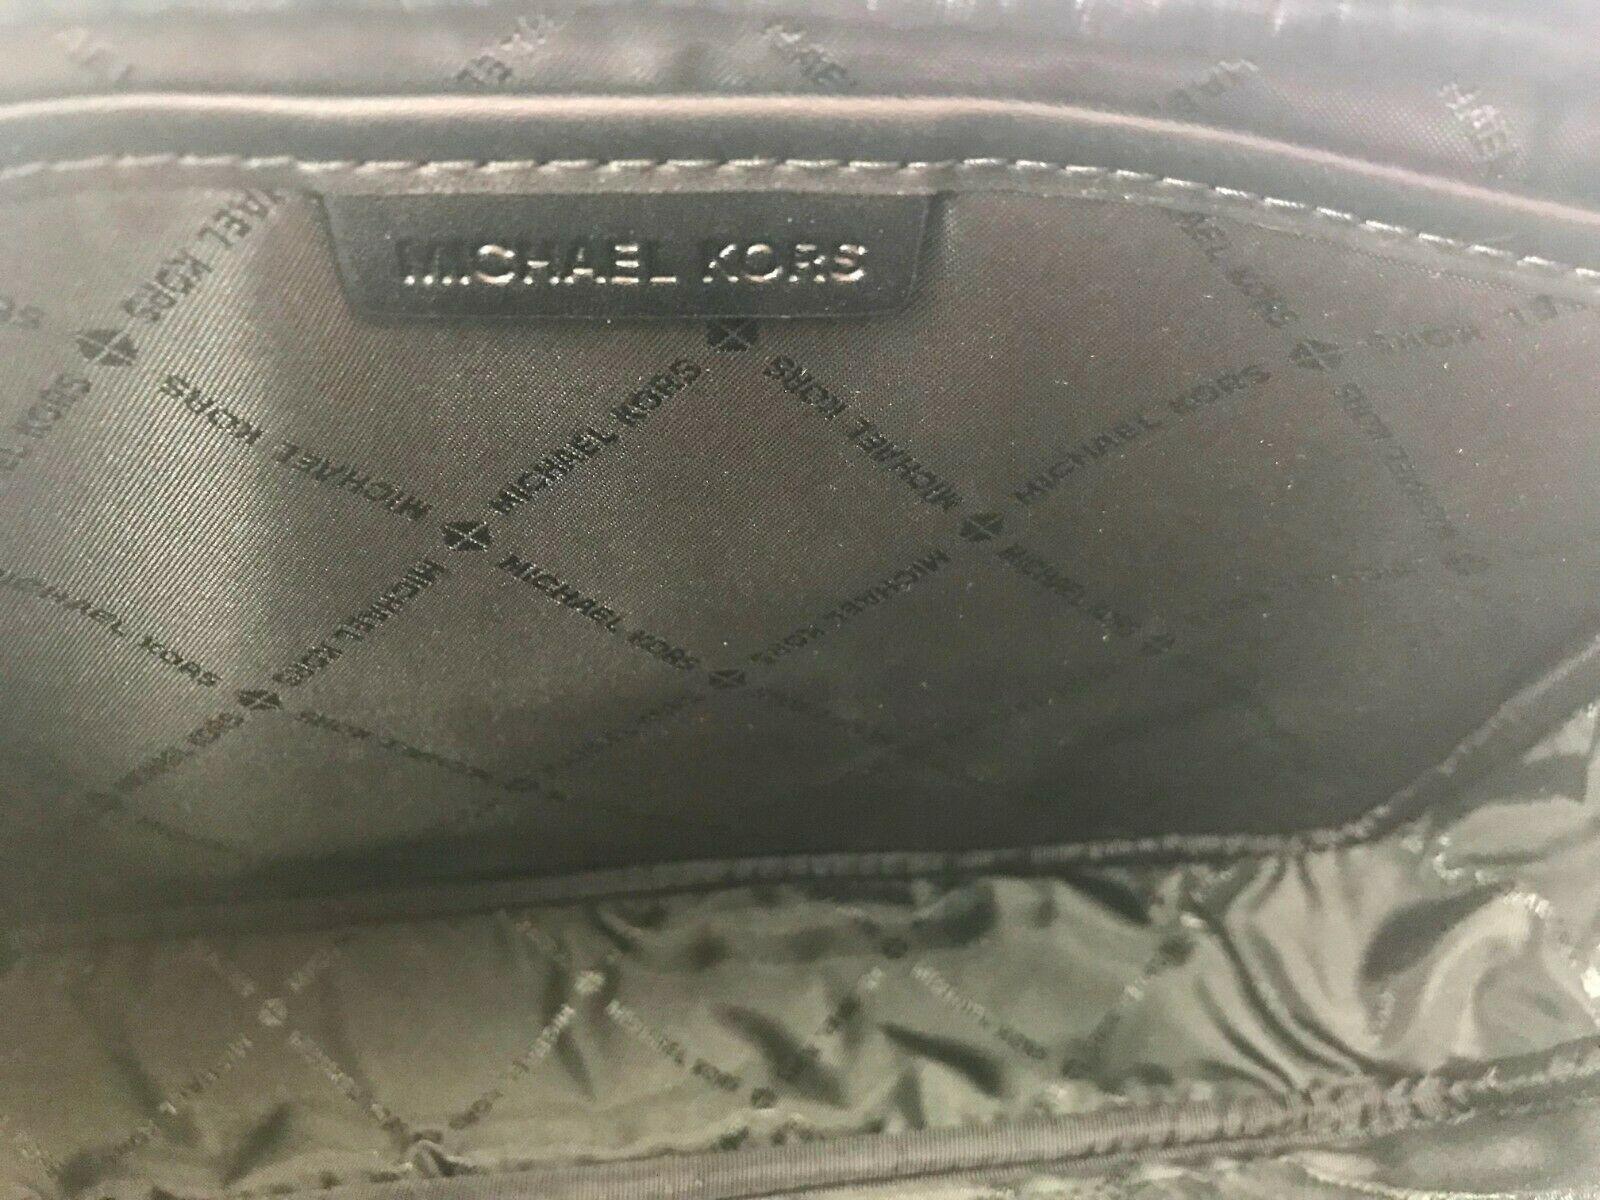 Michael Kors Fulton Sport PVC Monogram Cross Body Box Bag Black Medium Handbag